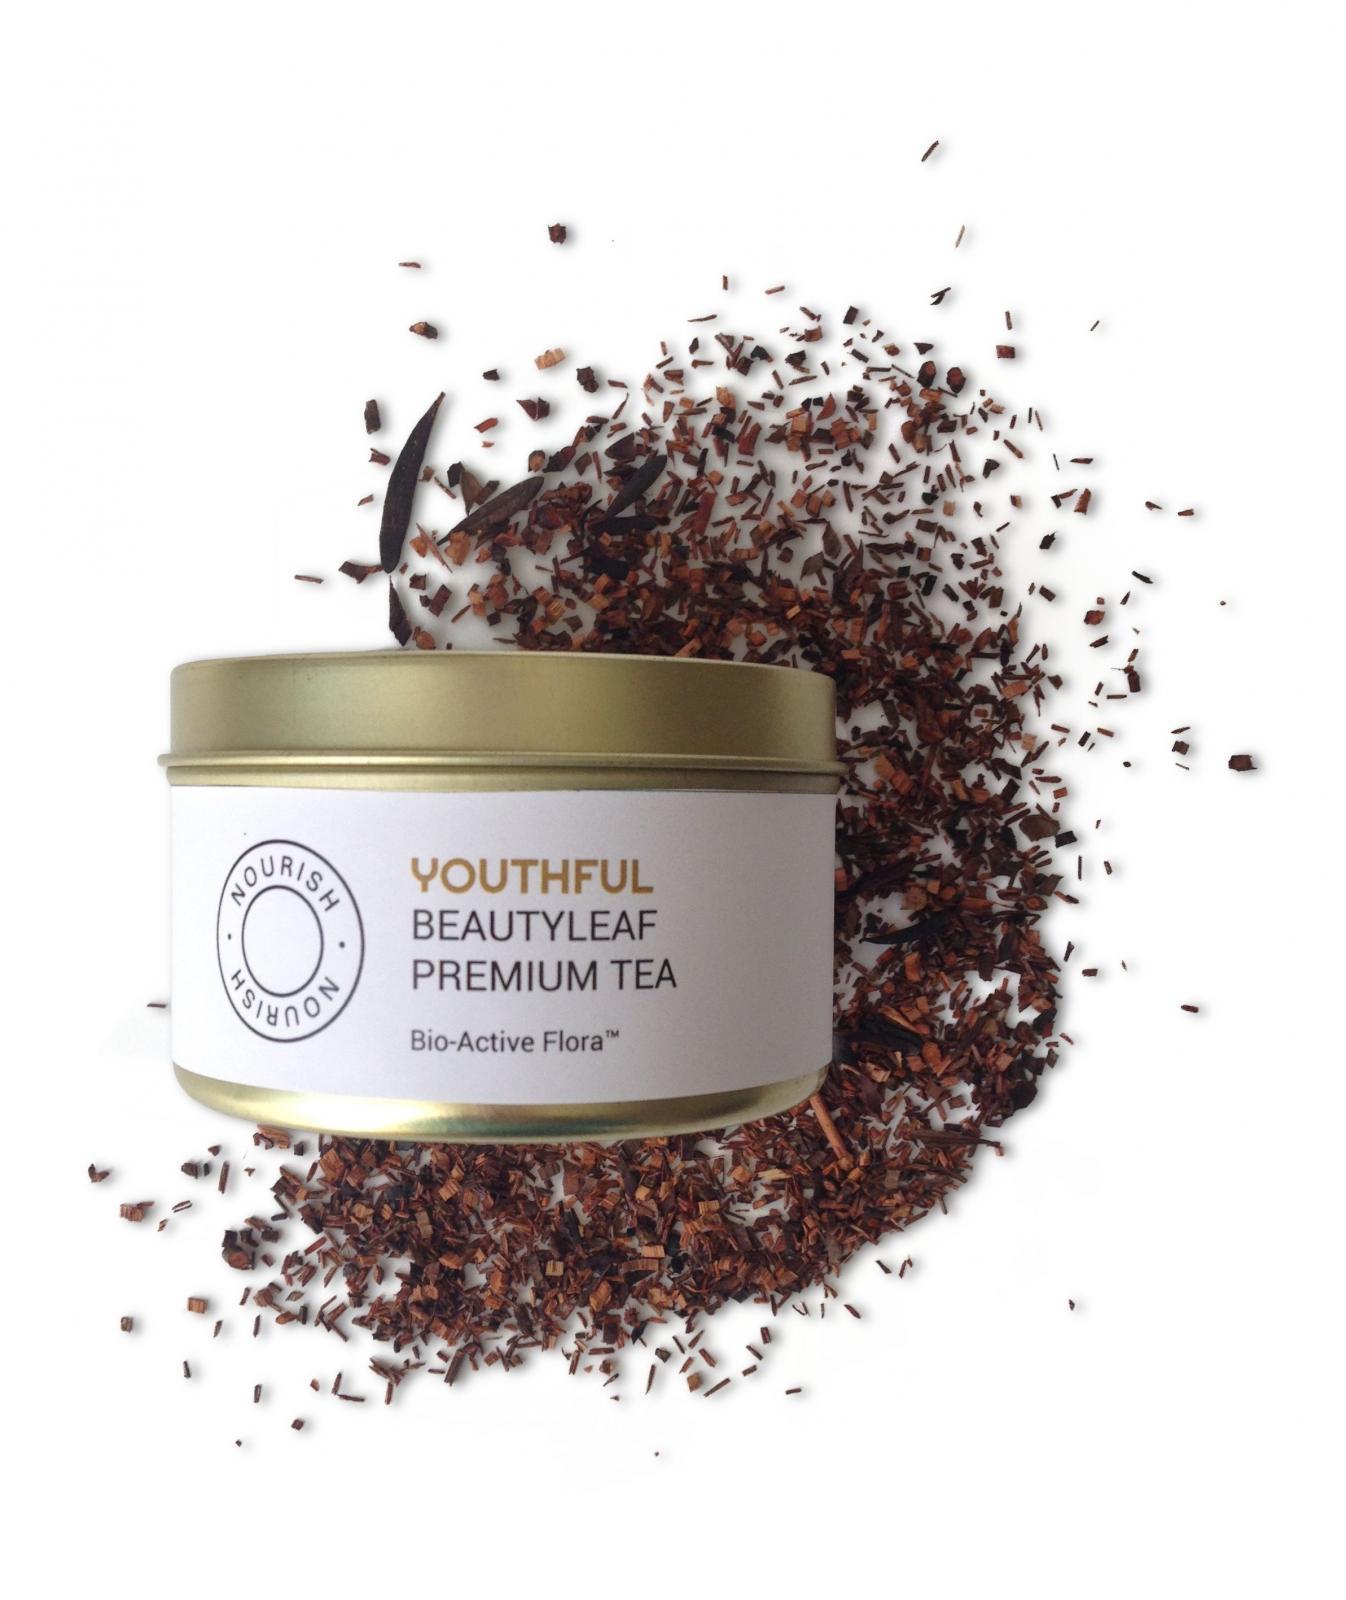 Youthful BeautyLeaf Premium Tea